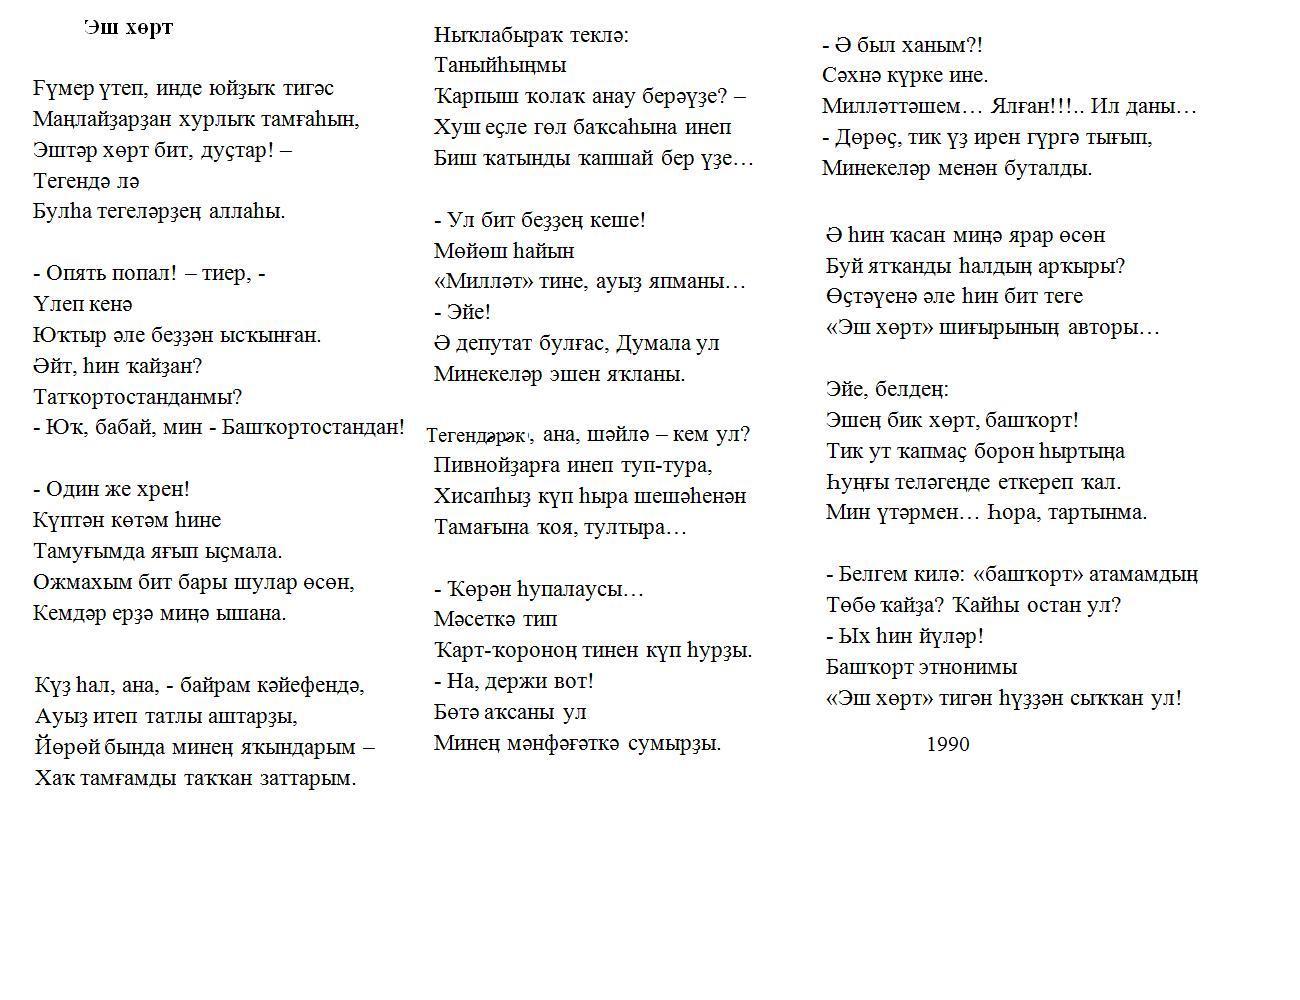 сочинения о зиме 6 класс на башкирском языке